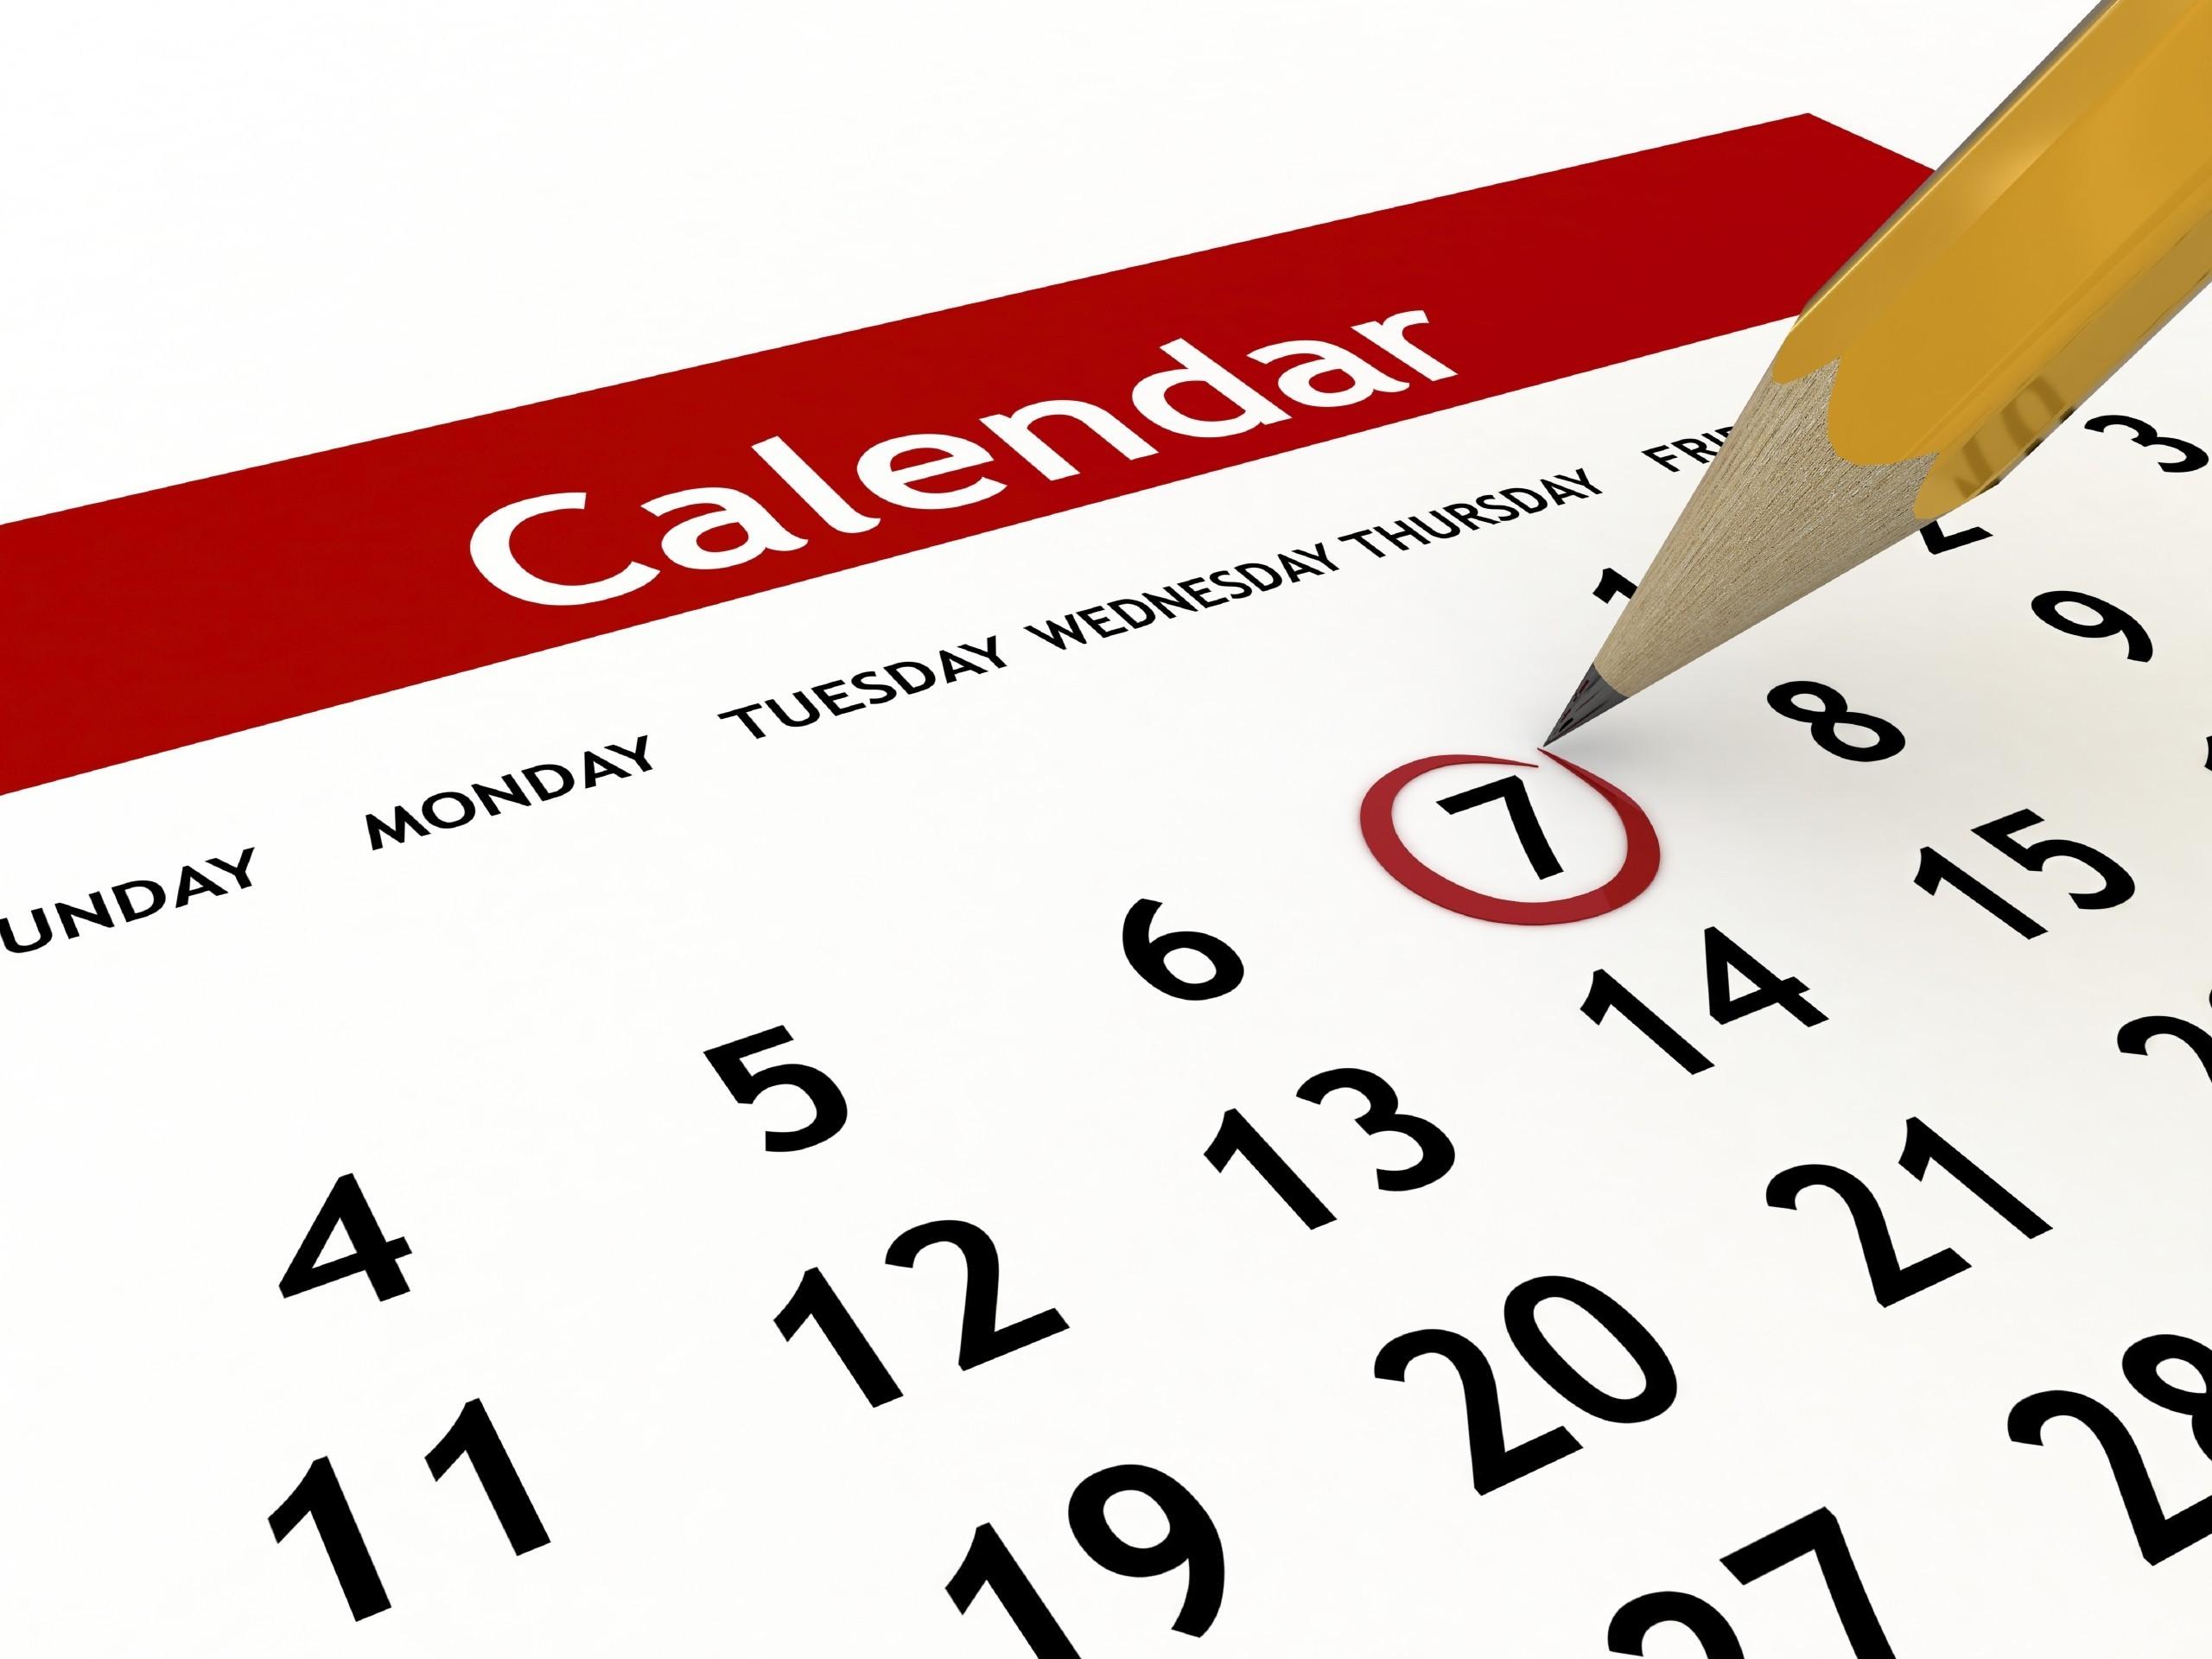 Hercules Tours - La Coruna Sightseeing Calendar